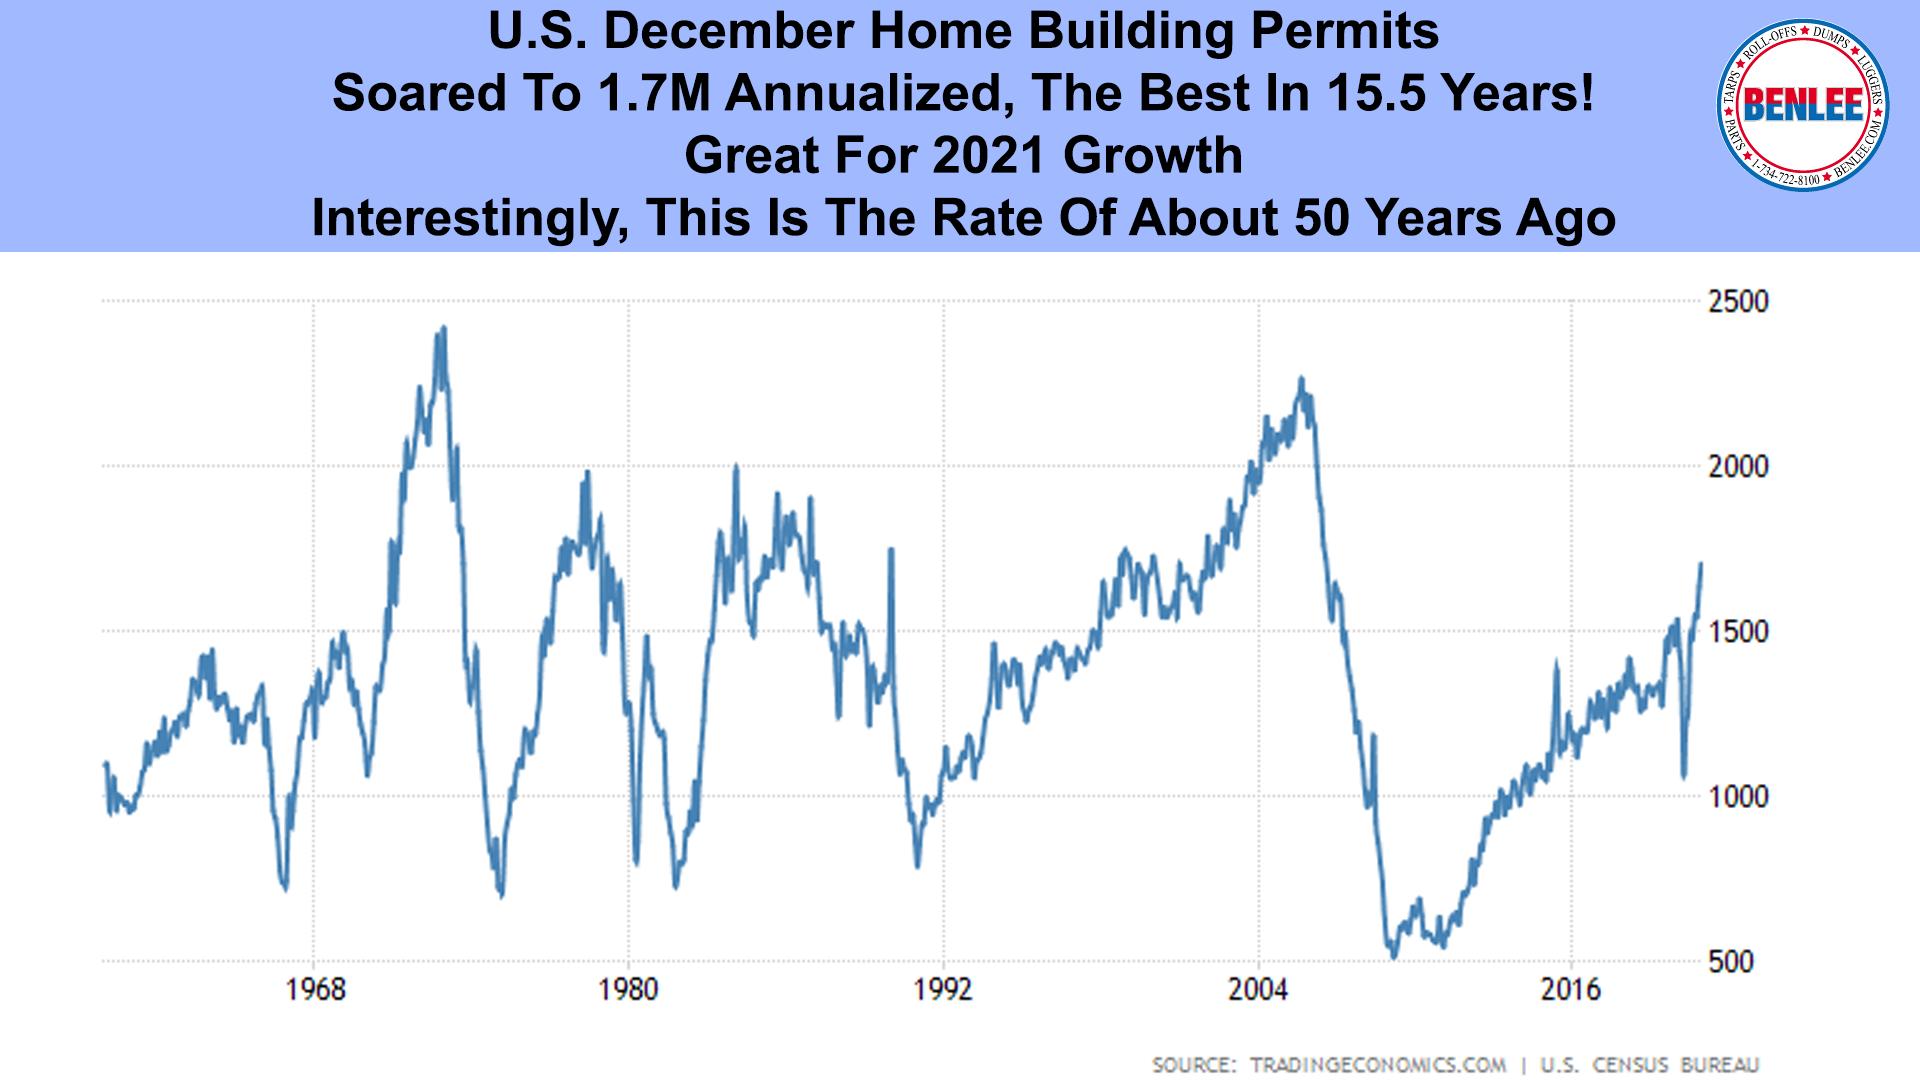 U.S. December Home Building Permits